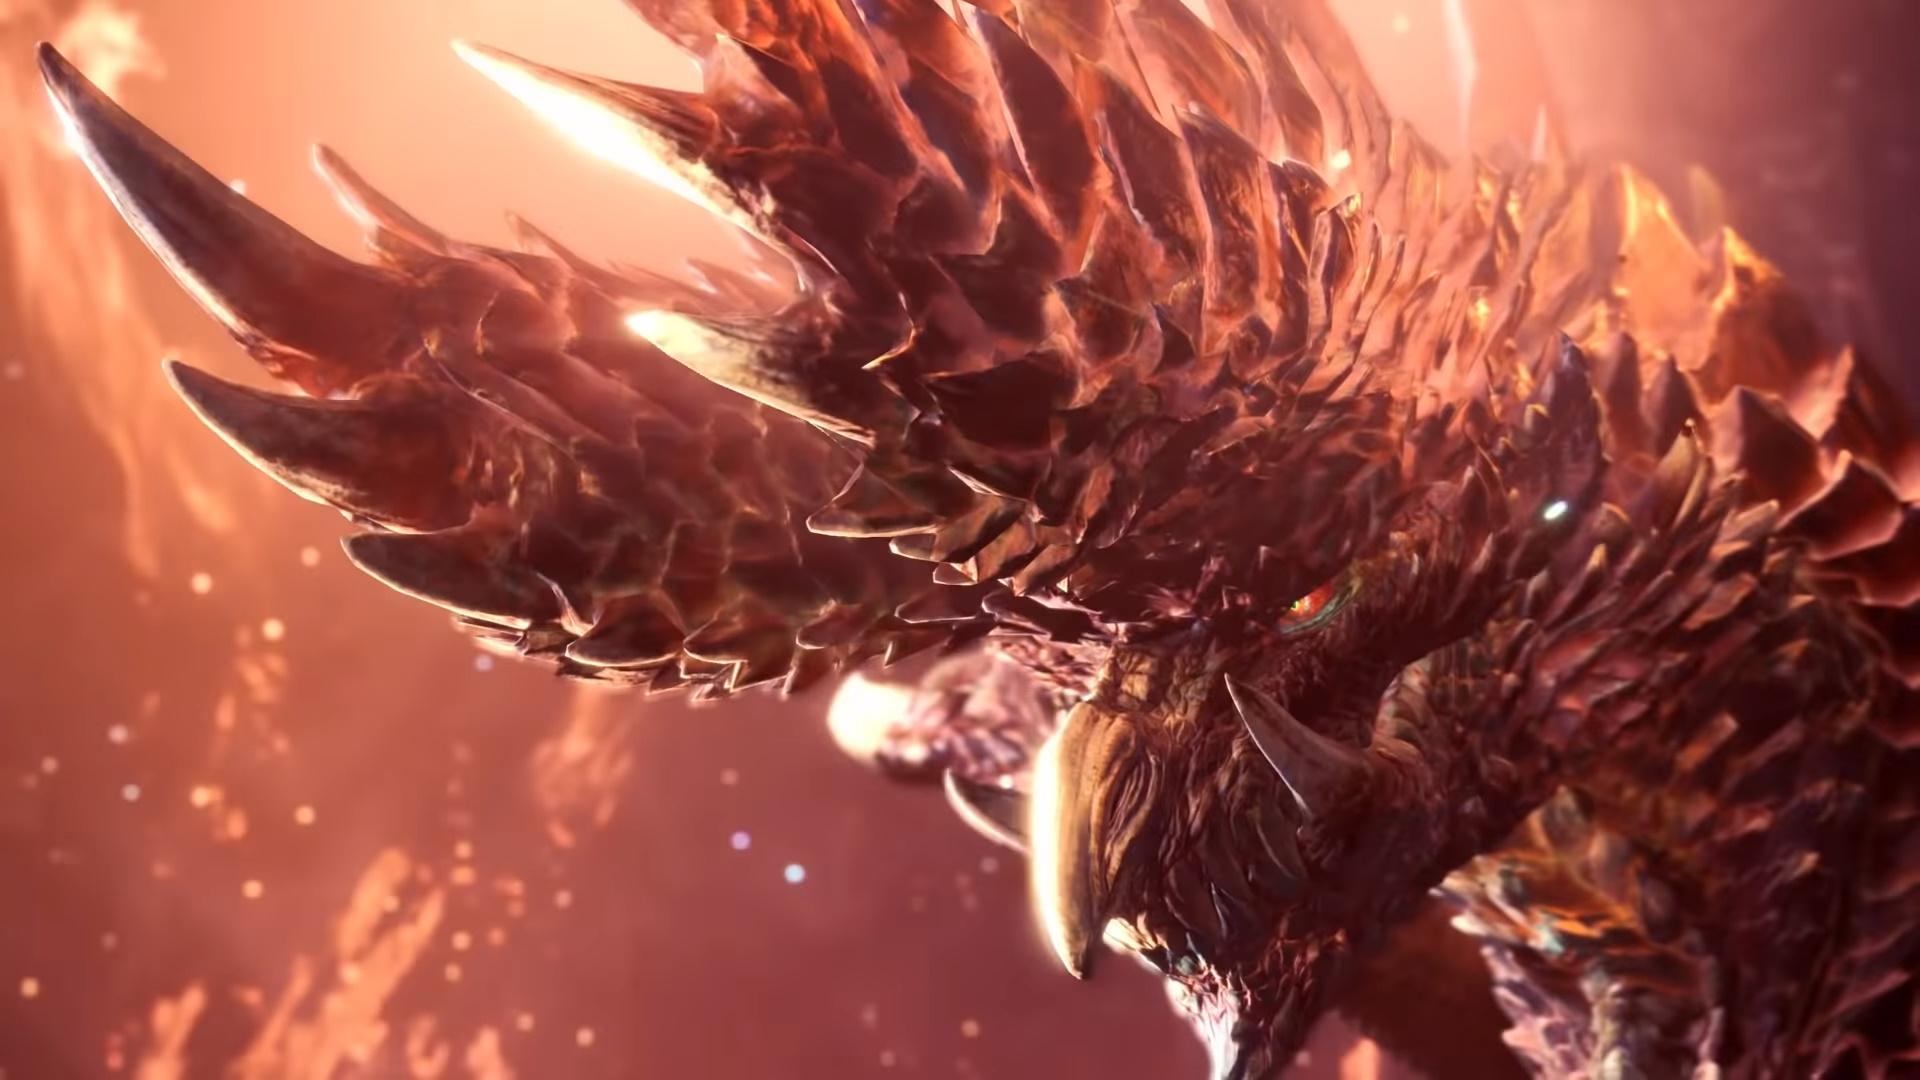 Monster Hunter World Iceborne Will Add The Elder Dragon Alatreon